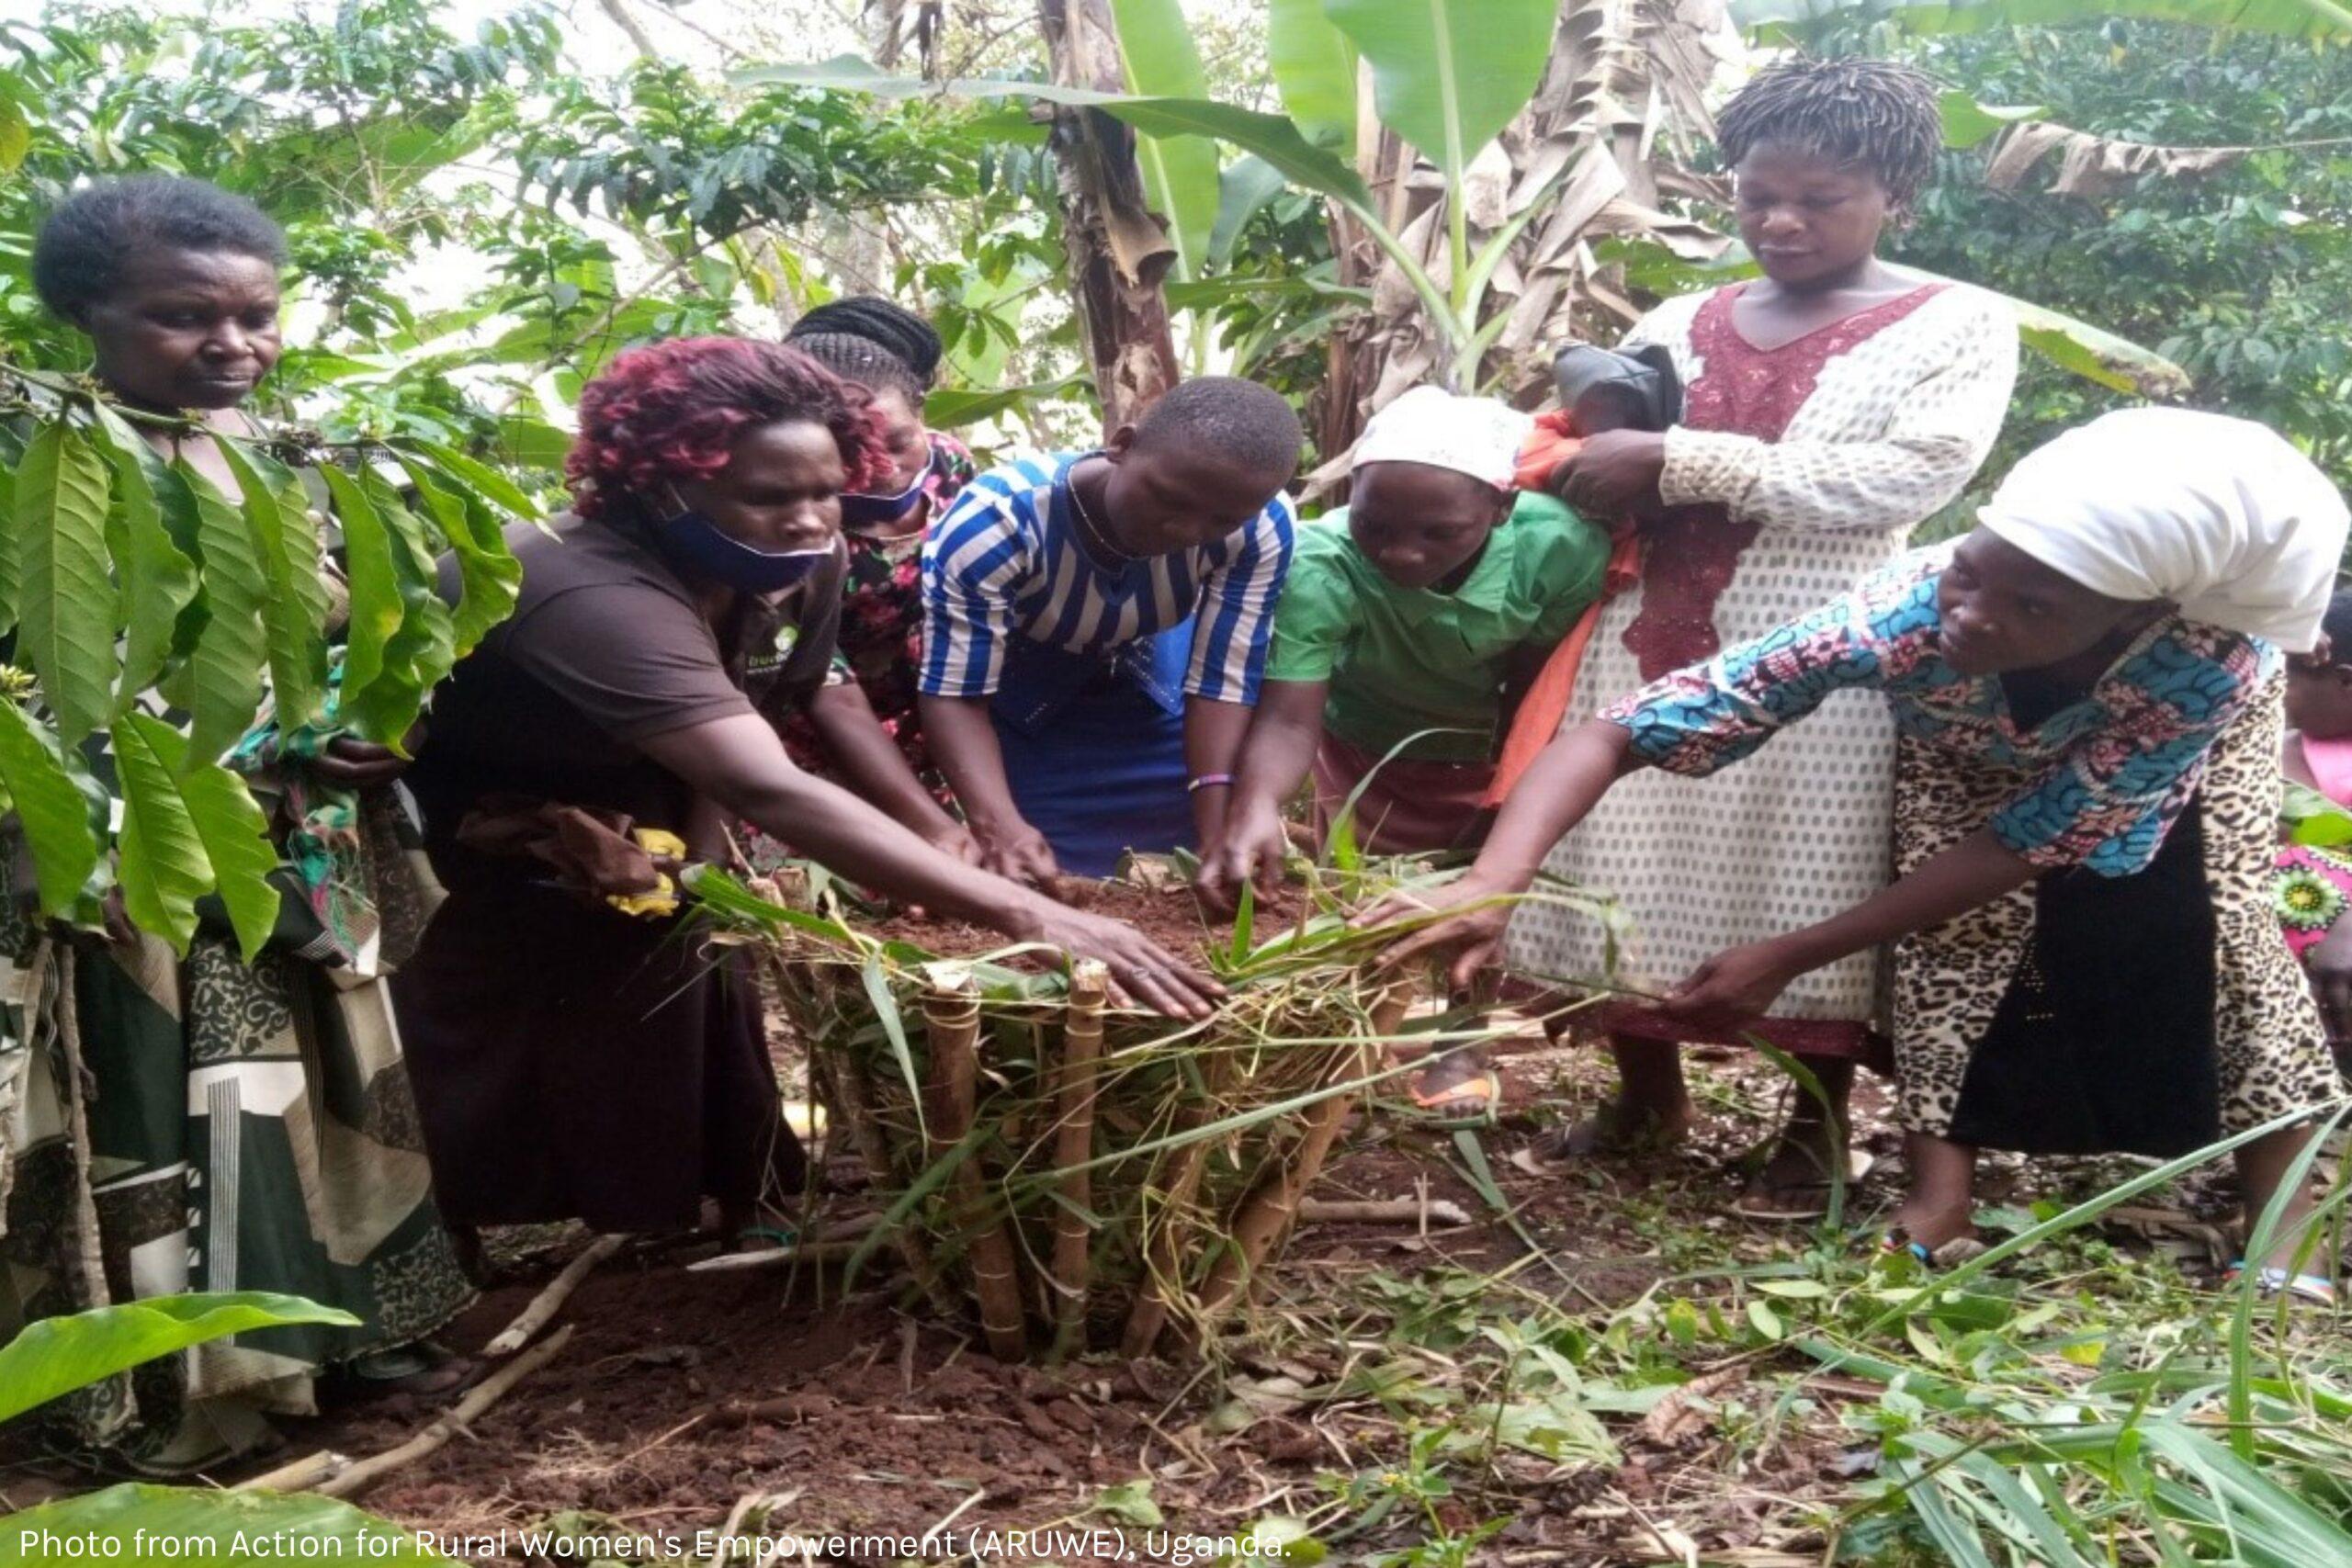 Action for Rural Women's Empowerment, Uganda